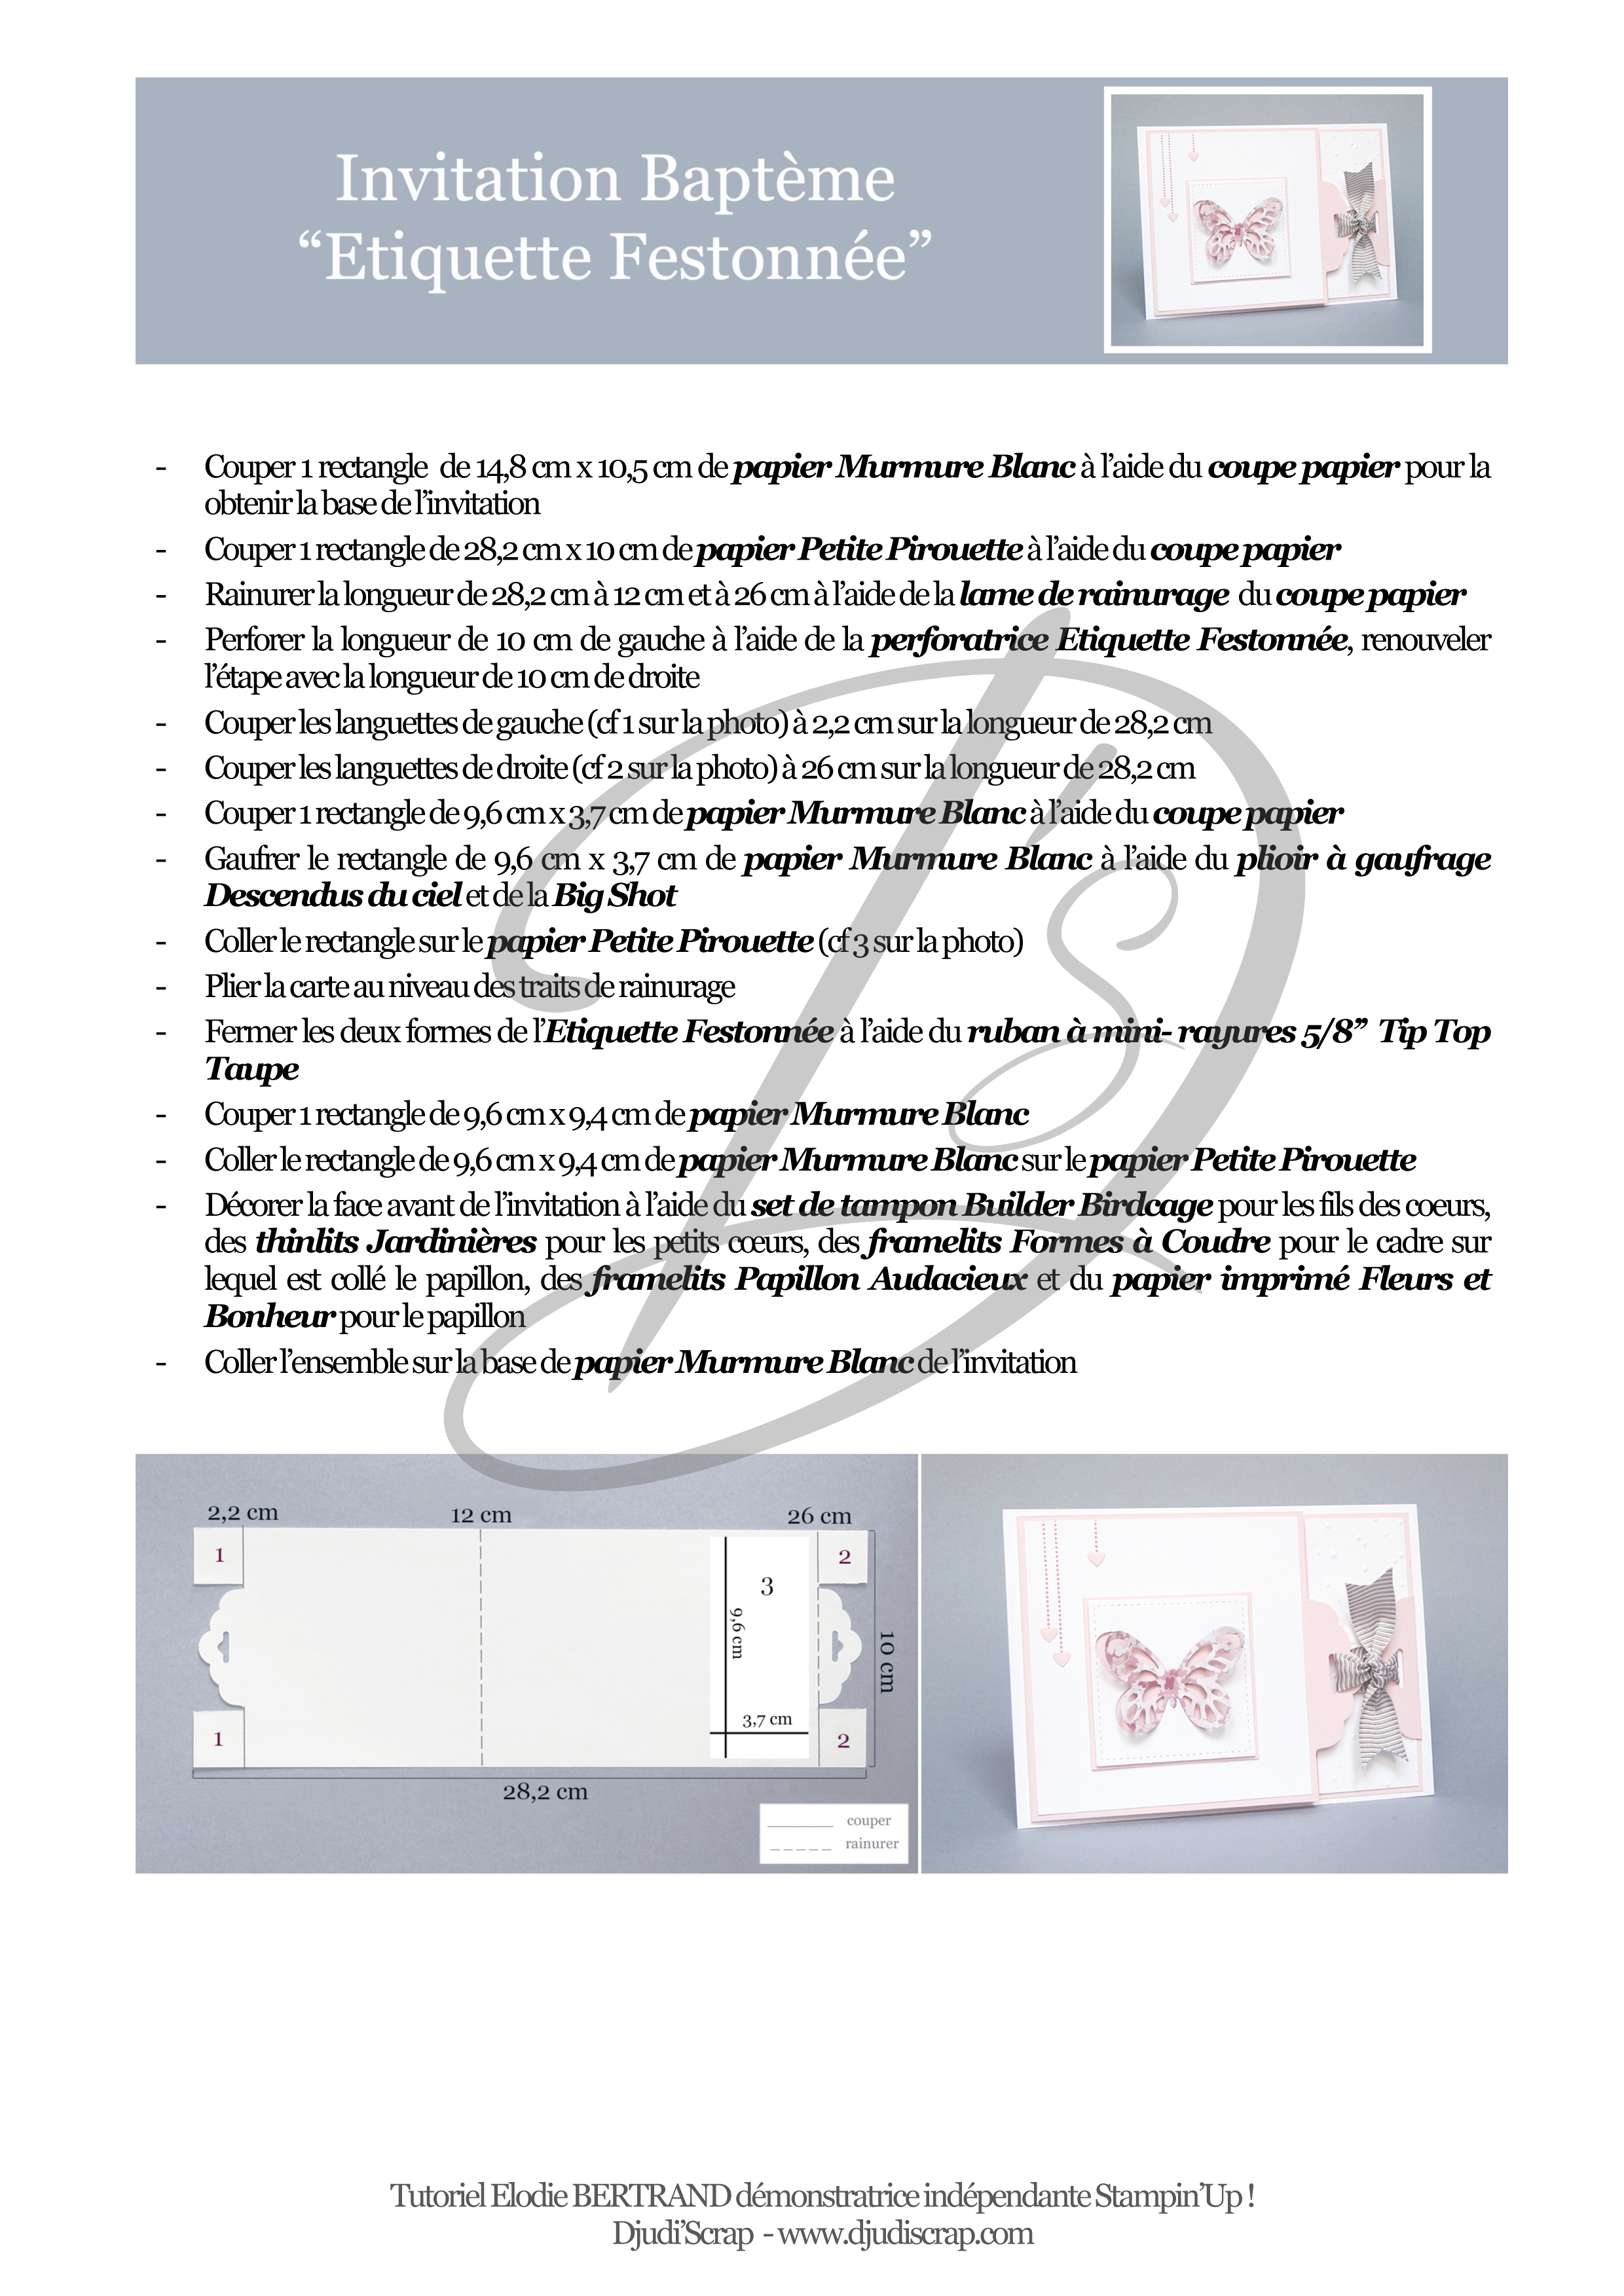 Microsoft Word - Invitation Baptme Etiquette FestonnŽe 1.doc